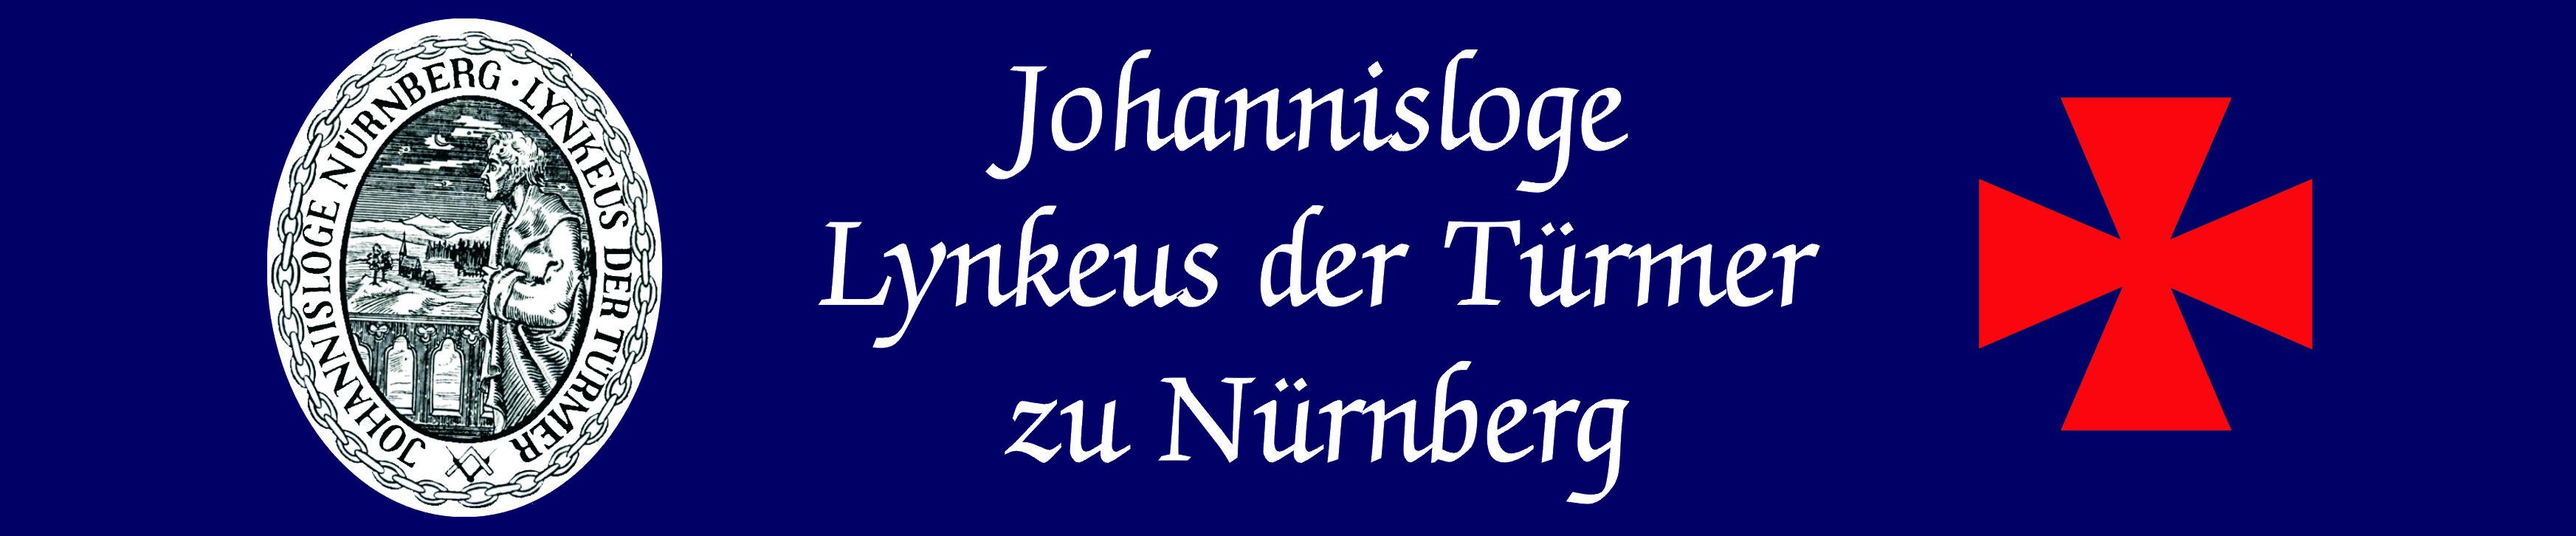 Freimaurer Johannisloge Lynkeus der Türmer